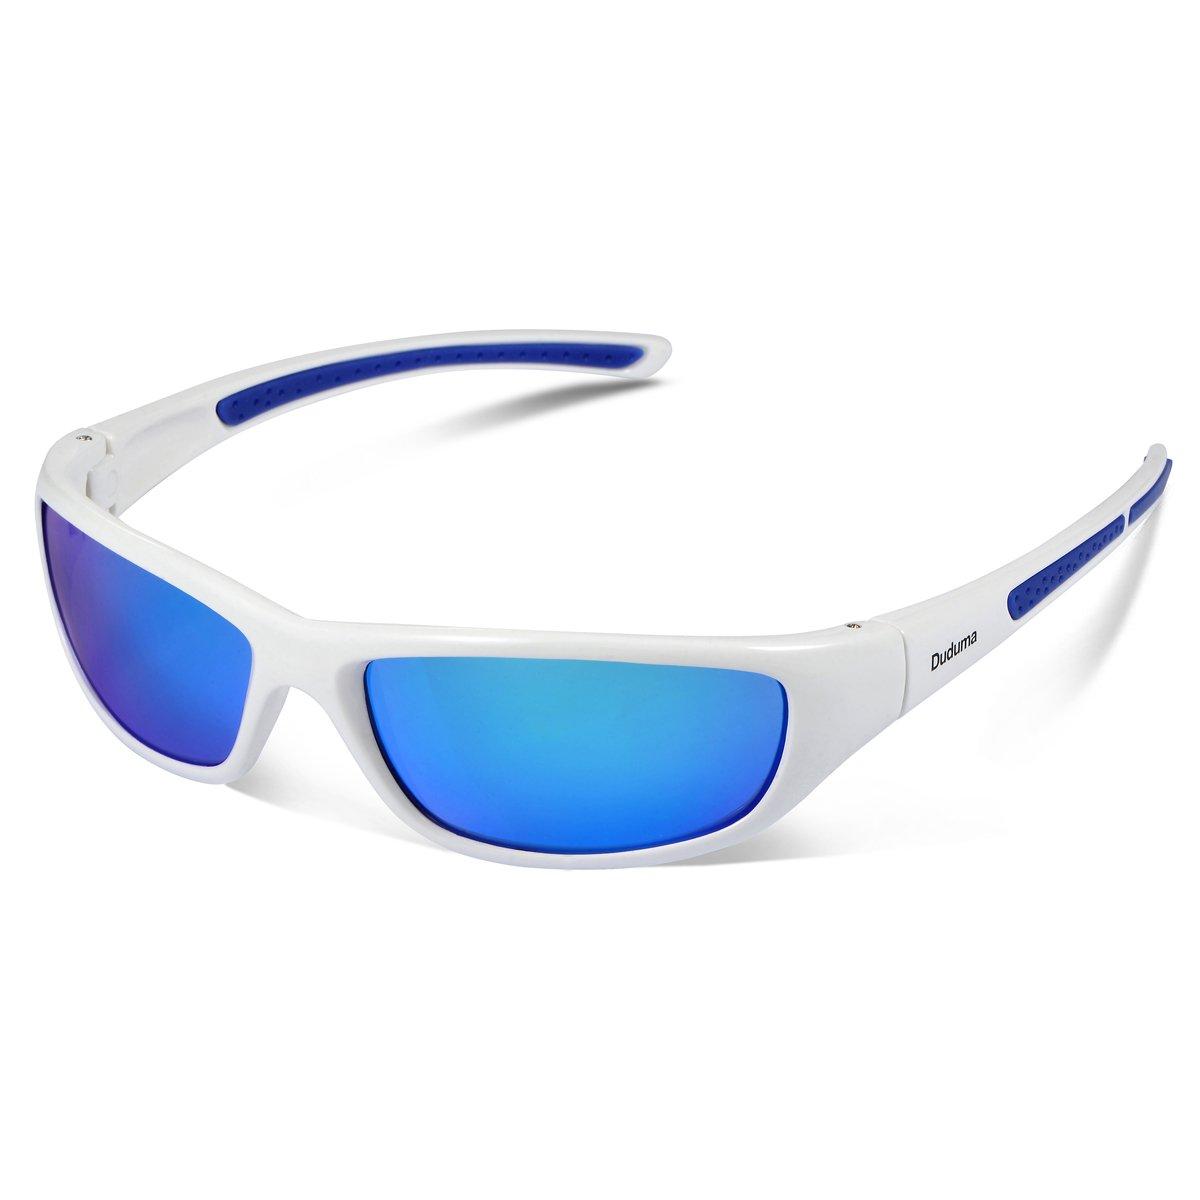 Duduma Tr8116 Polarized Sports Sunglasses for Baseball Cycling Fishing Golf Superlight Frame by Duduma